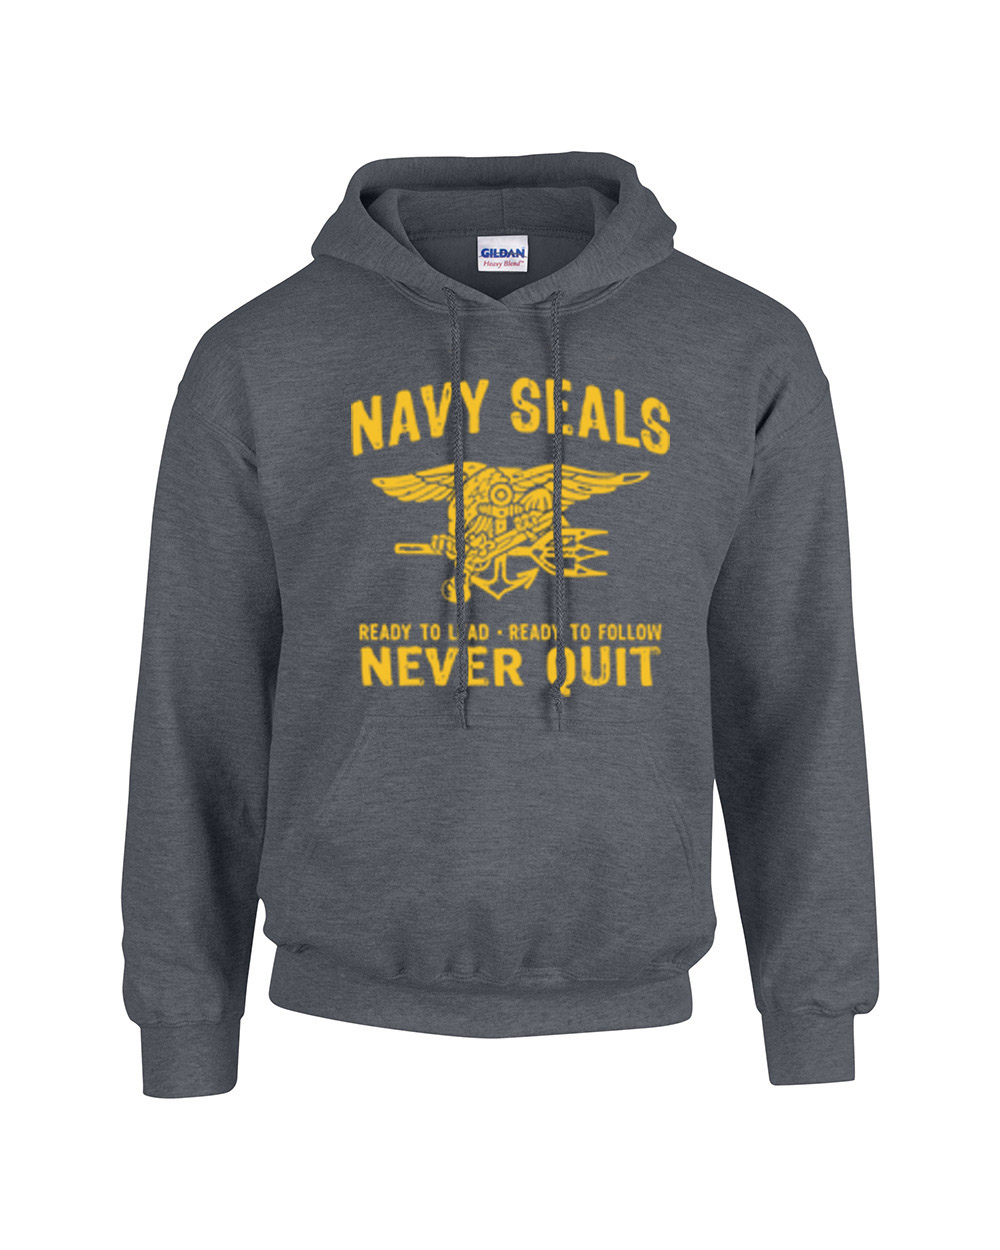 United States Navy Seals Never Quit Hooded Sweatshirt US Navy   eBay